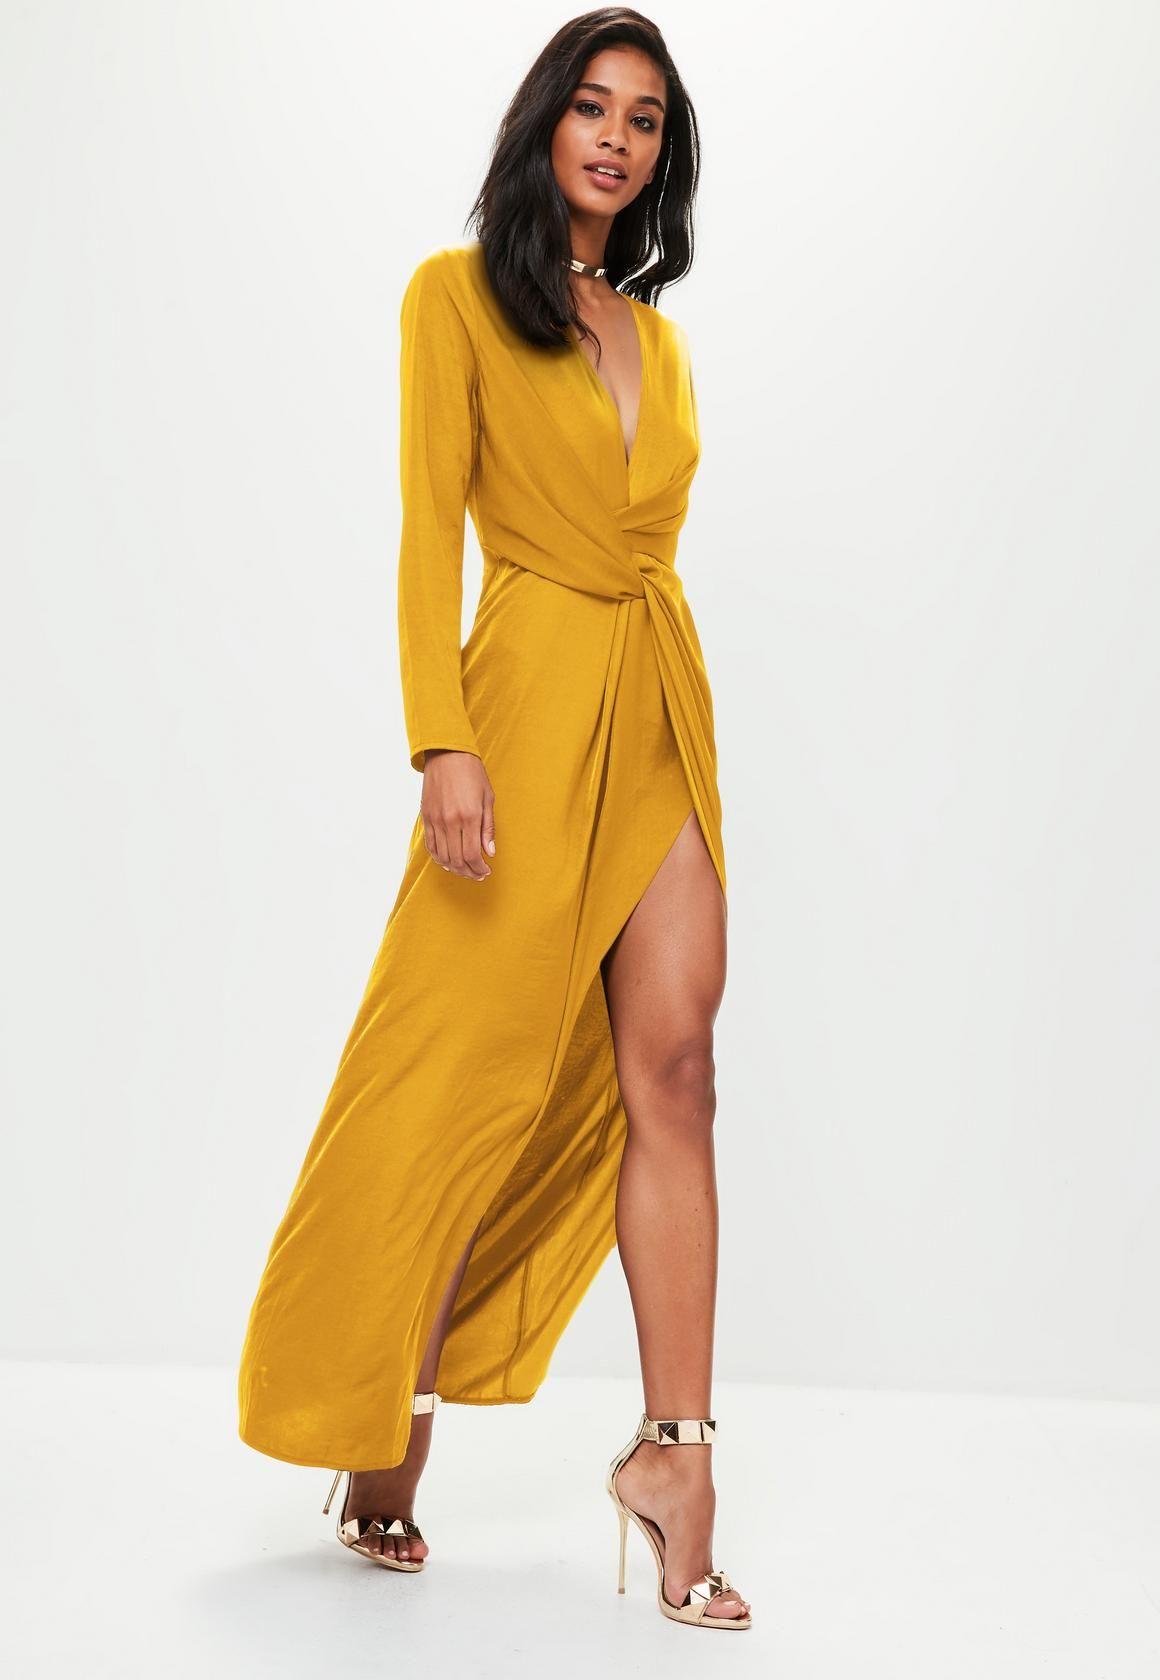 Mustard Yellow Satin Asymmetric Twist Front Maxi Dress Missguided Yellow Maxi Dress Yellow Evening Dresses Yellow Dress Outfit [ 1680 x 1160 Pixel ]